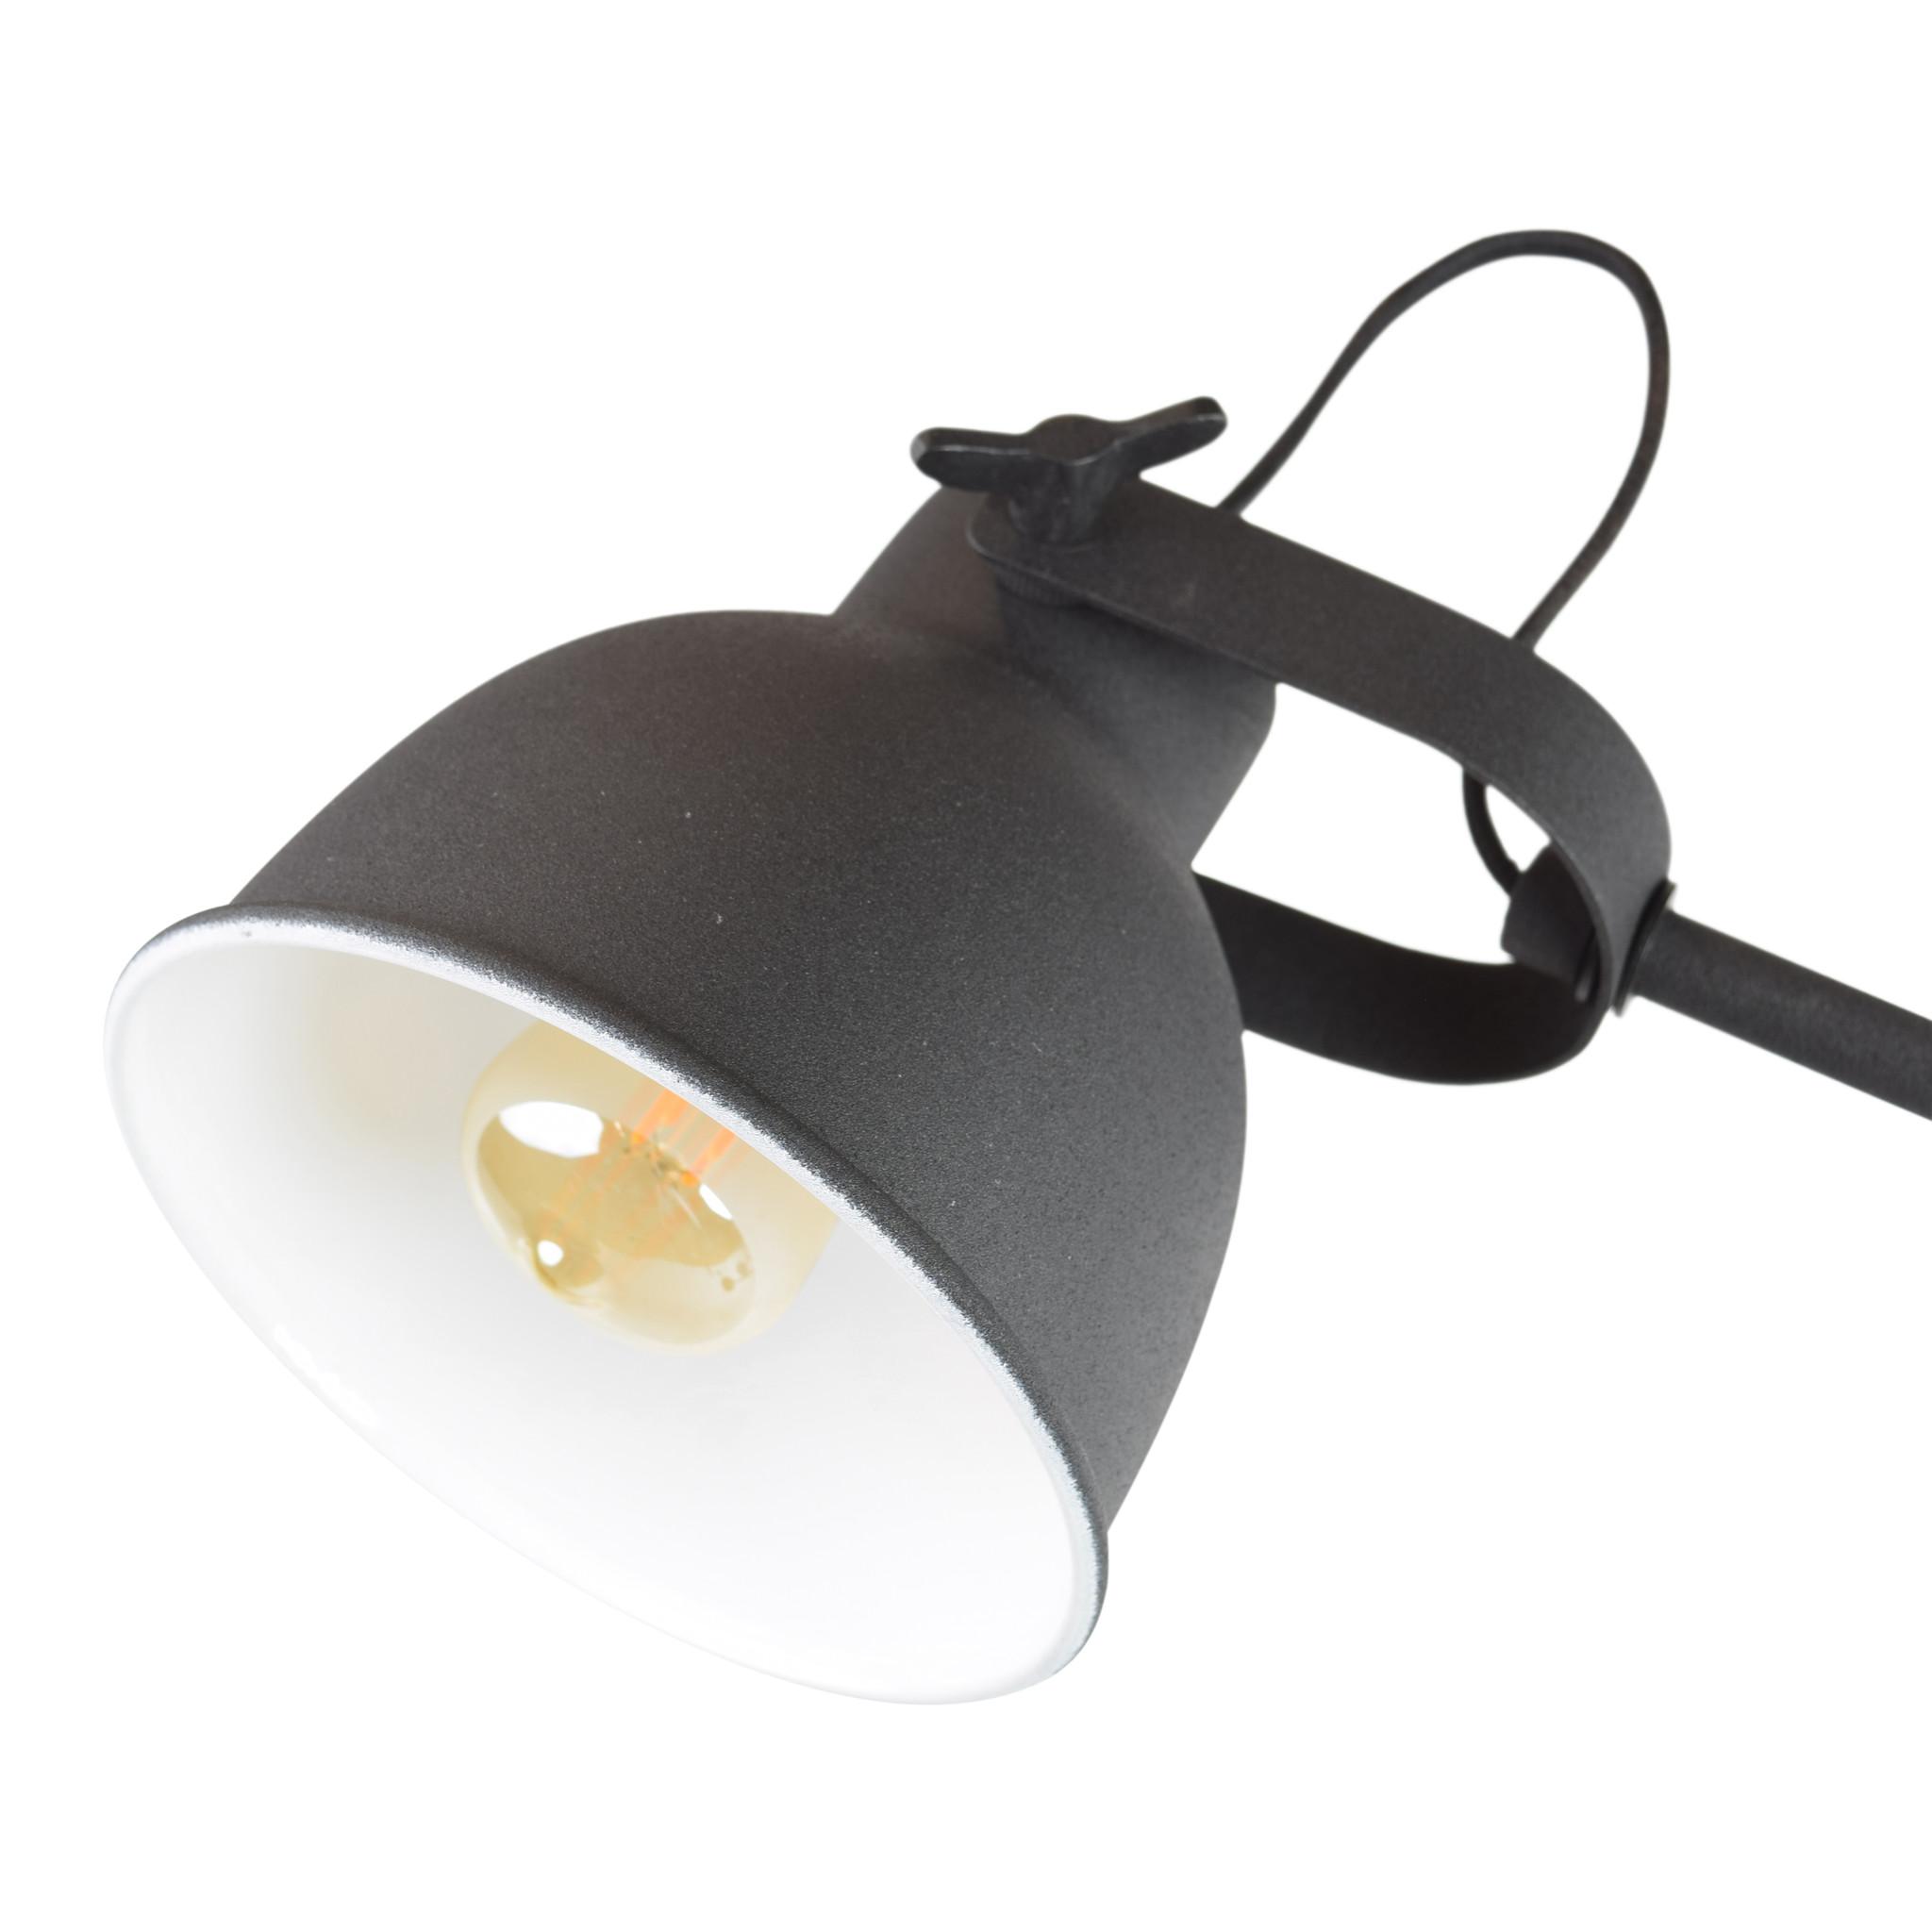 Urban Interiors Urban Interiors Vloerlamp Industrial vintage black-AI-WFL-15-234-VB-8719325005653